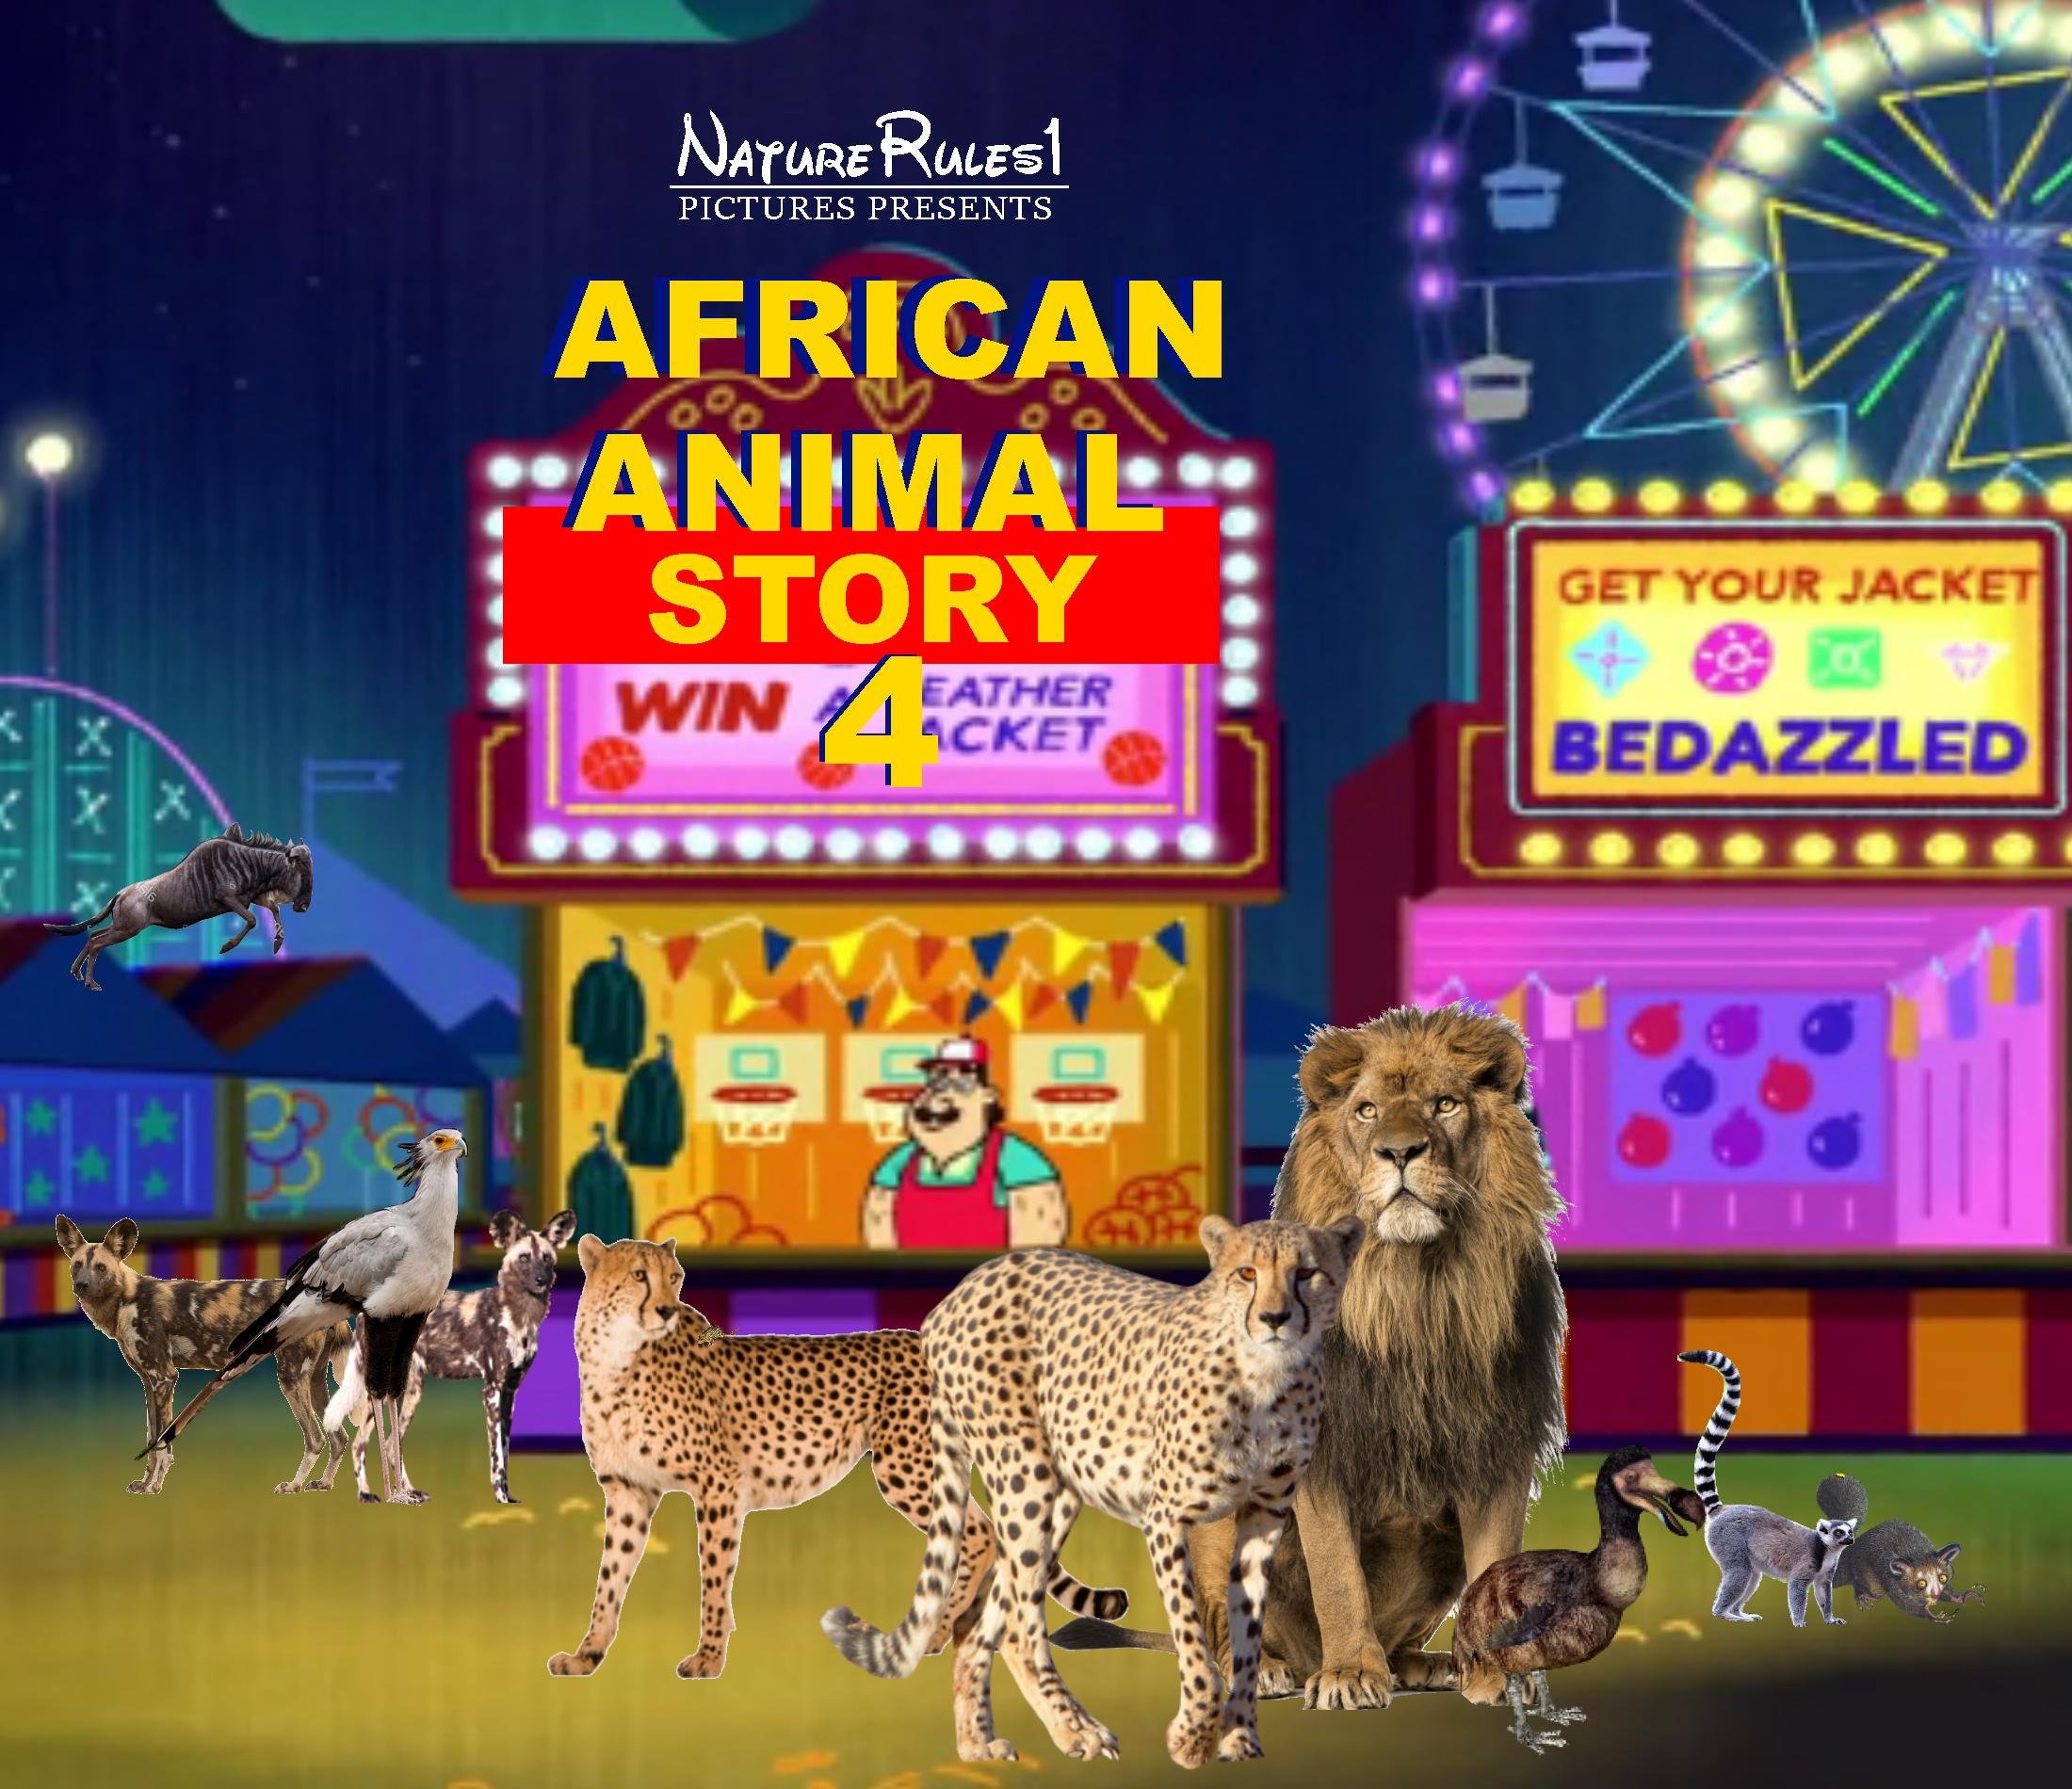 African Animal Story 4 (NatureRules1 Version)